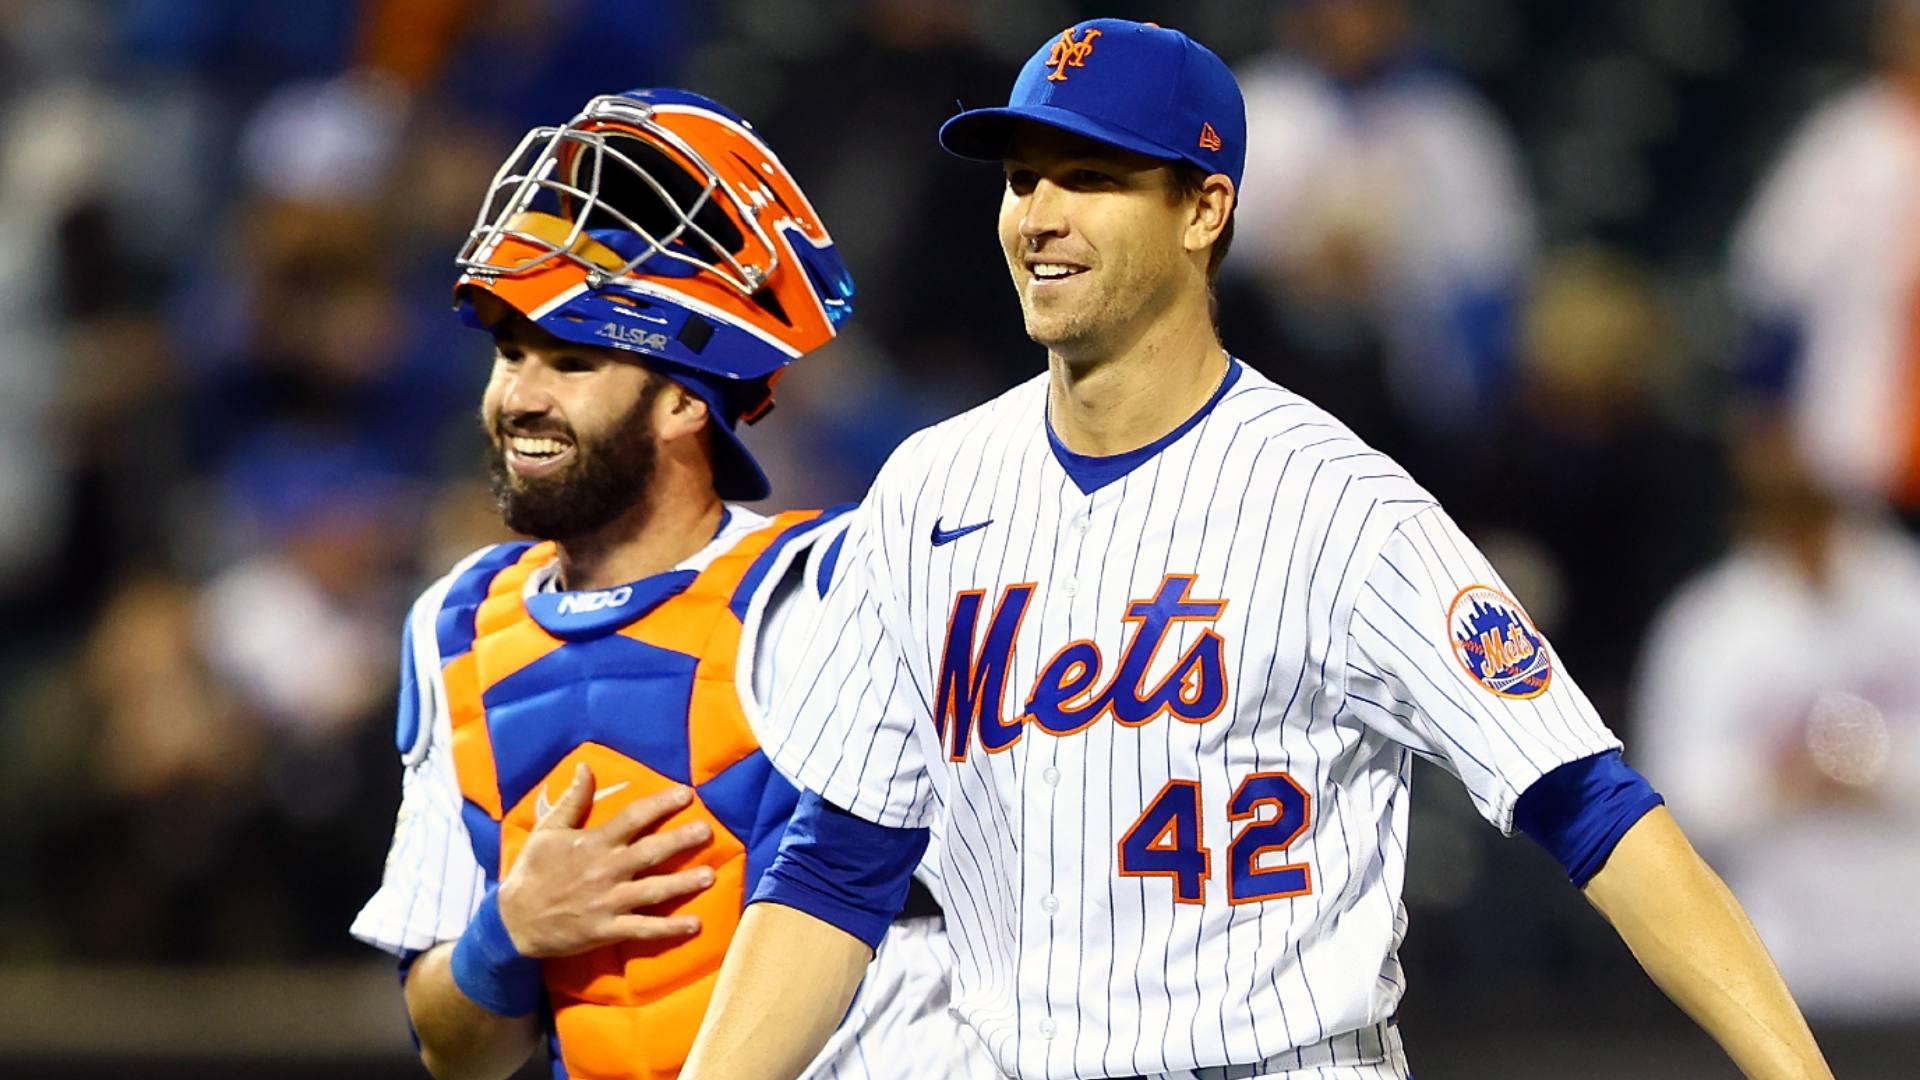 Umps check under Jacob deGrom's belt for sticky substance under new MLB rule